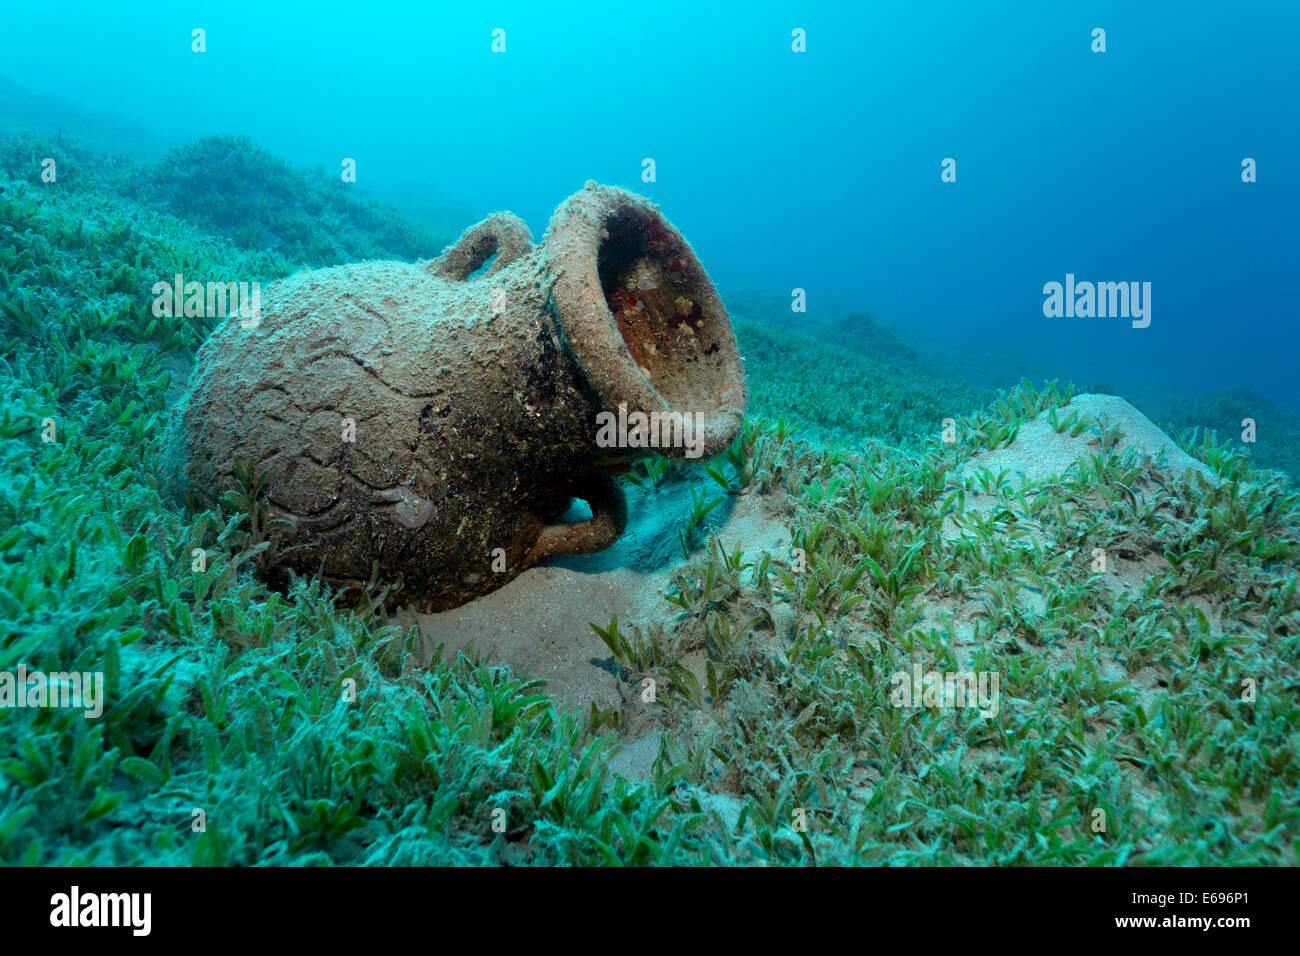 Amphora on seagrass meadow, Red Sea, Makadi Bay, Hurghada, Egypt - Stock Image